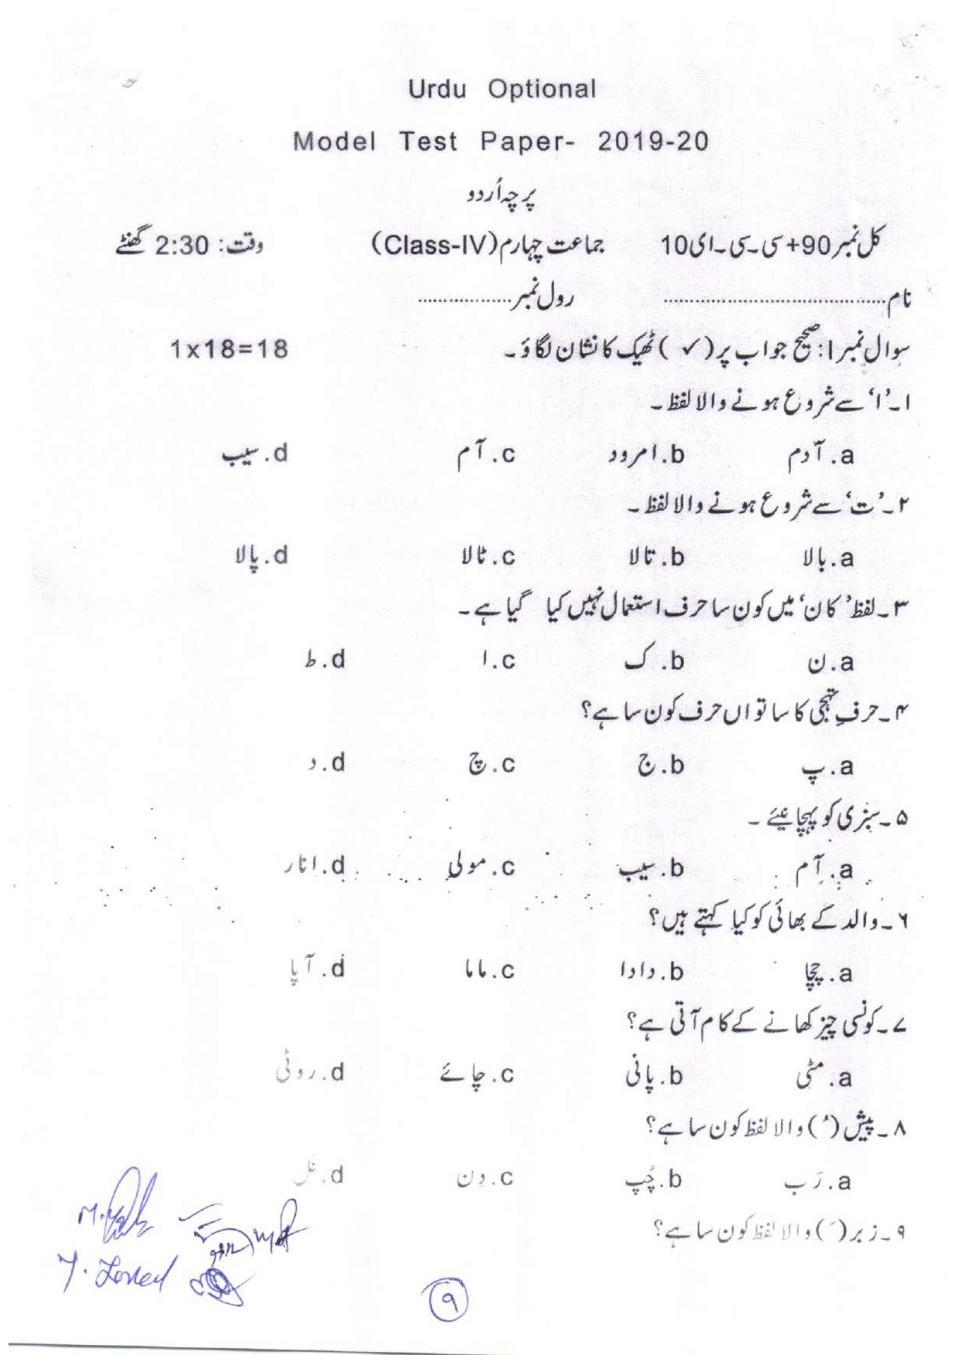 PSEB 4th Model Test Paper of Urdu Optional - Page 1